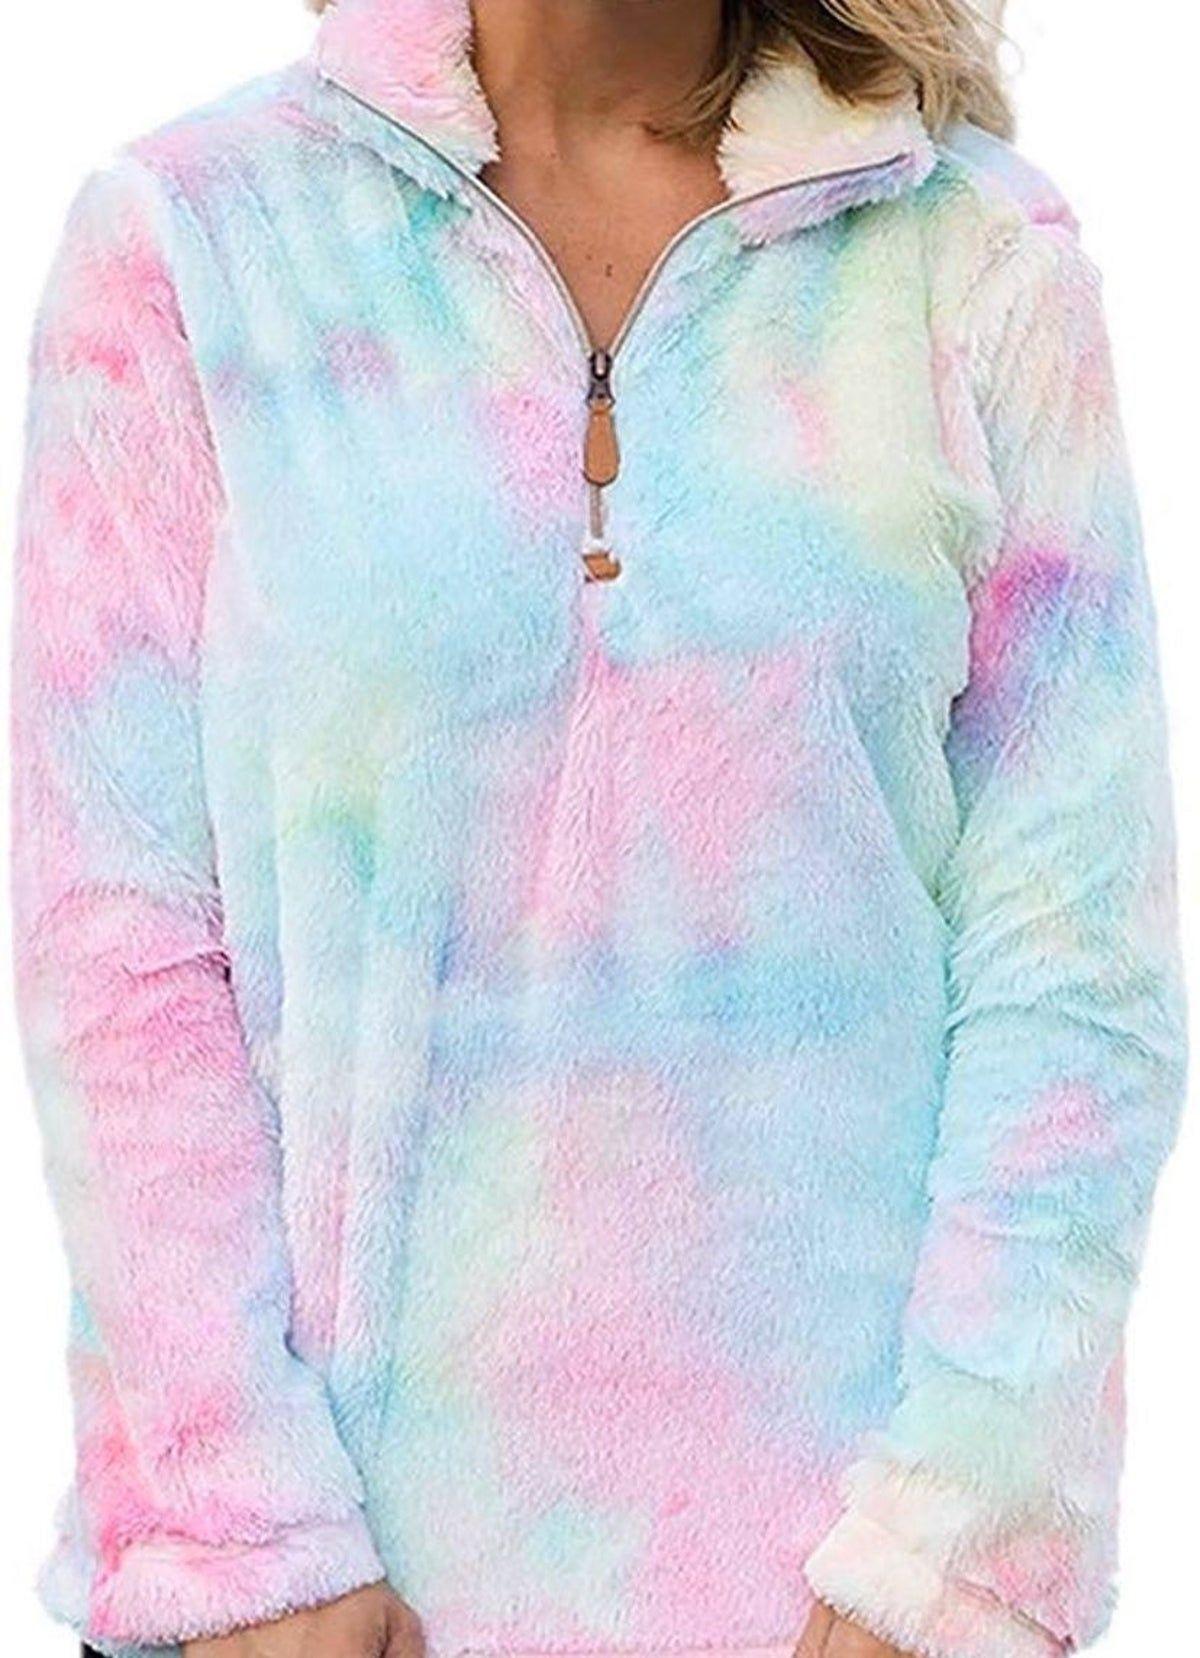 Pin By Dree Anna Kenzie On All Things Cotton Candy In 2021 Winter Outfits Warm Women Hoodies Sweatshirts Long Sweatshirt [ 1658 x 1200 Pixel ]